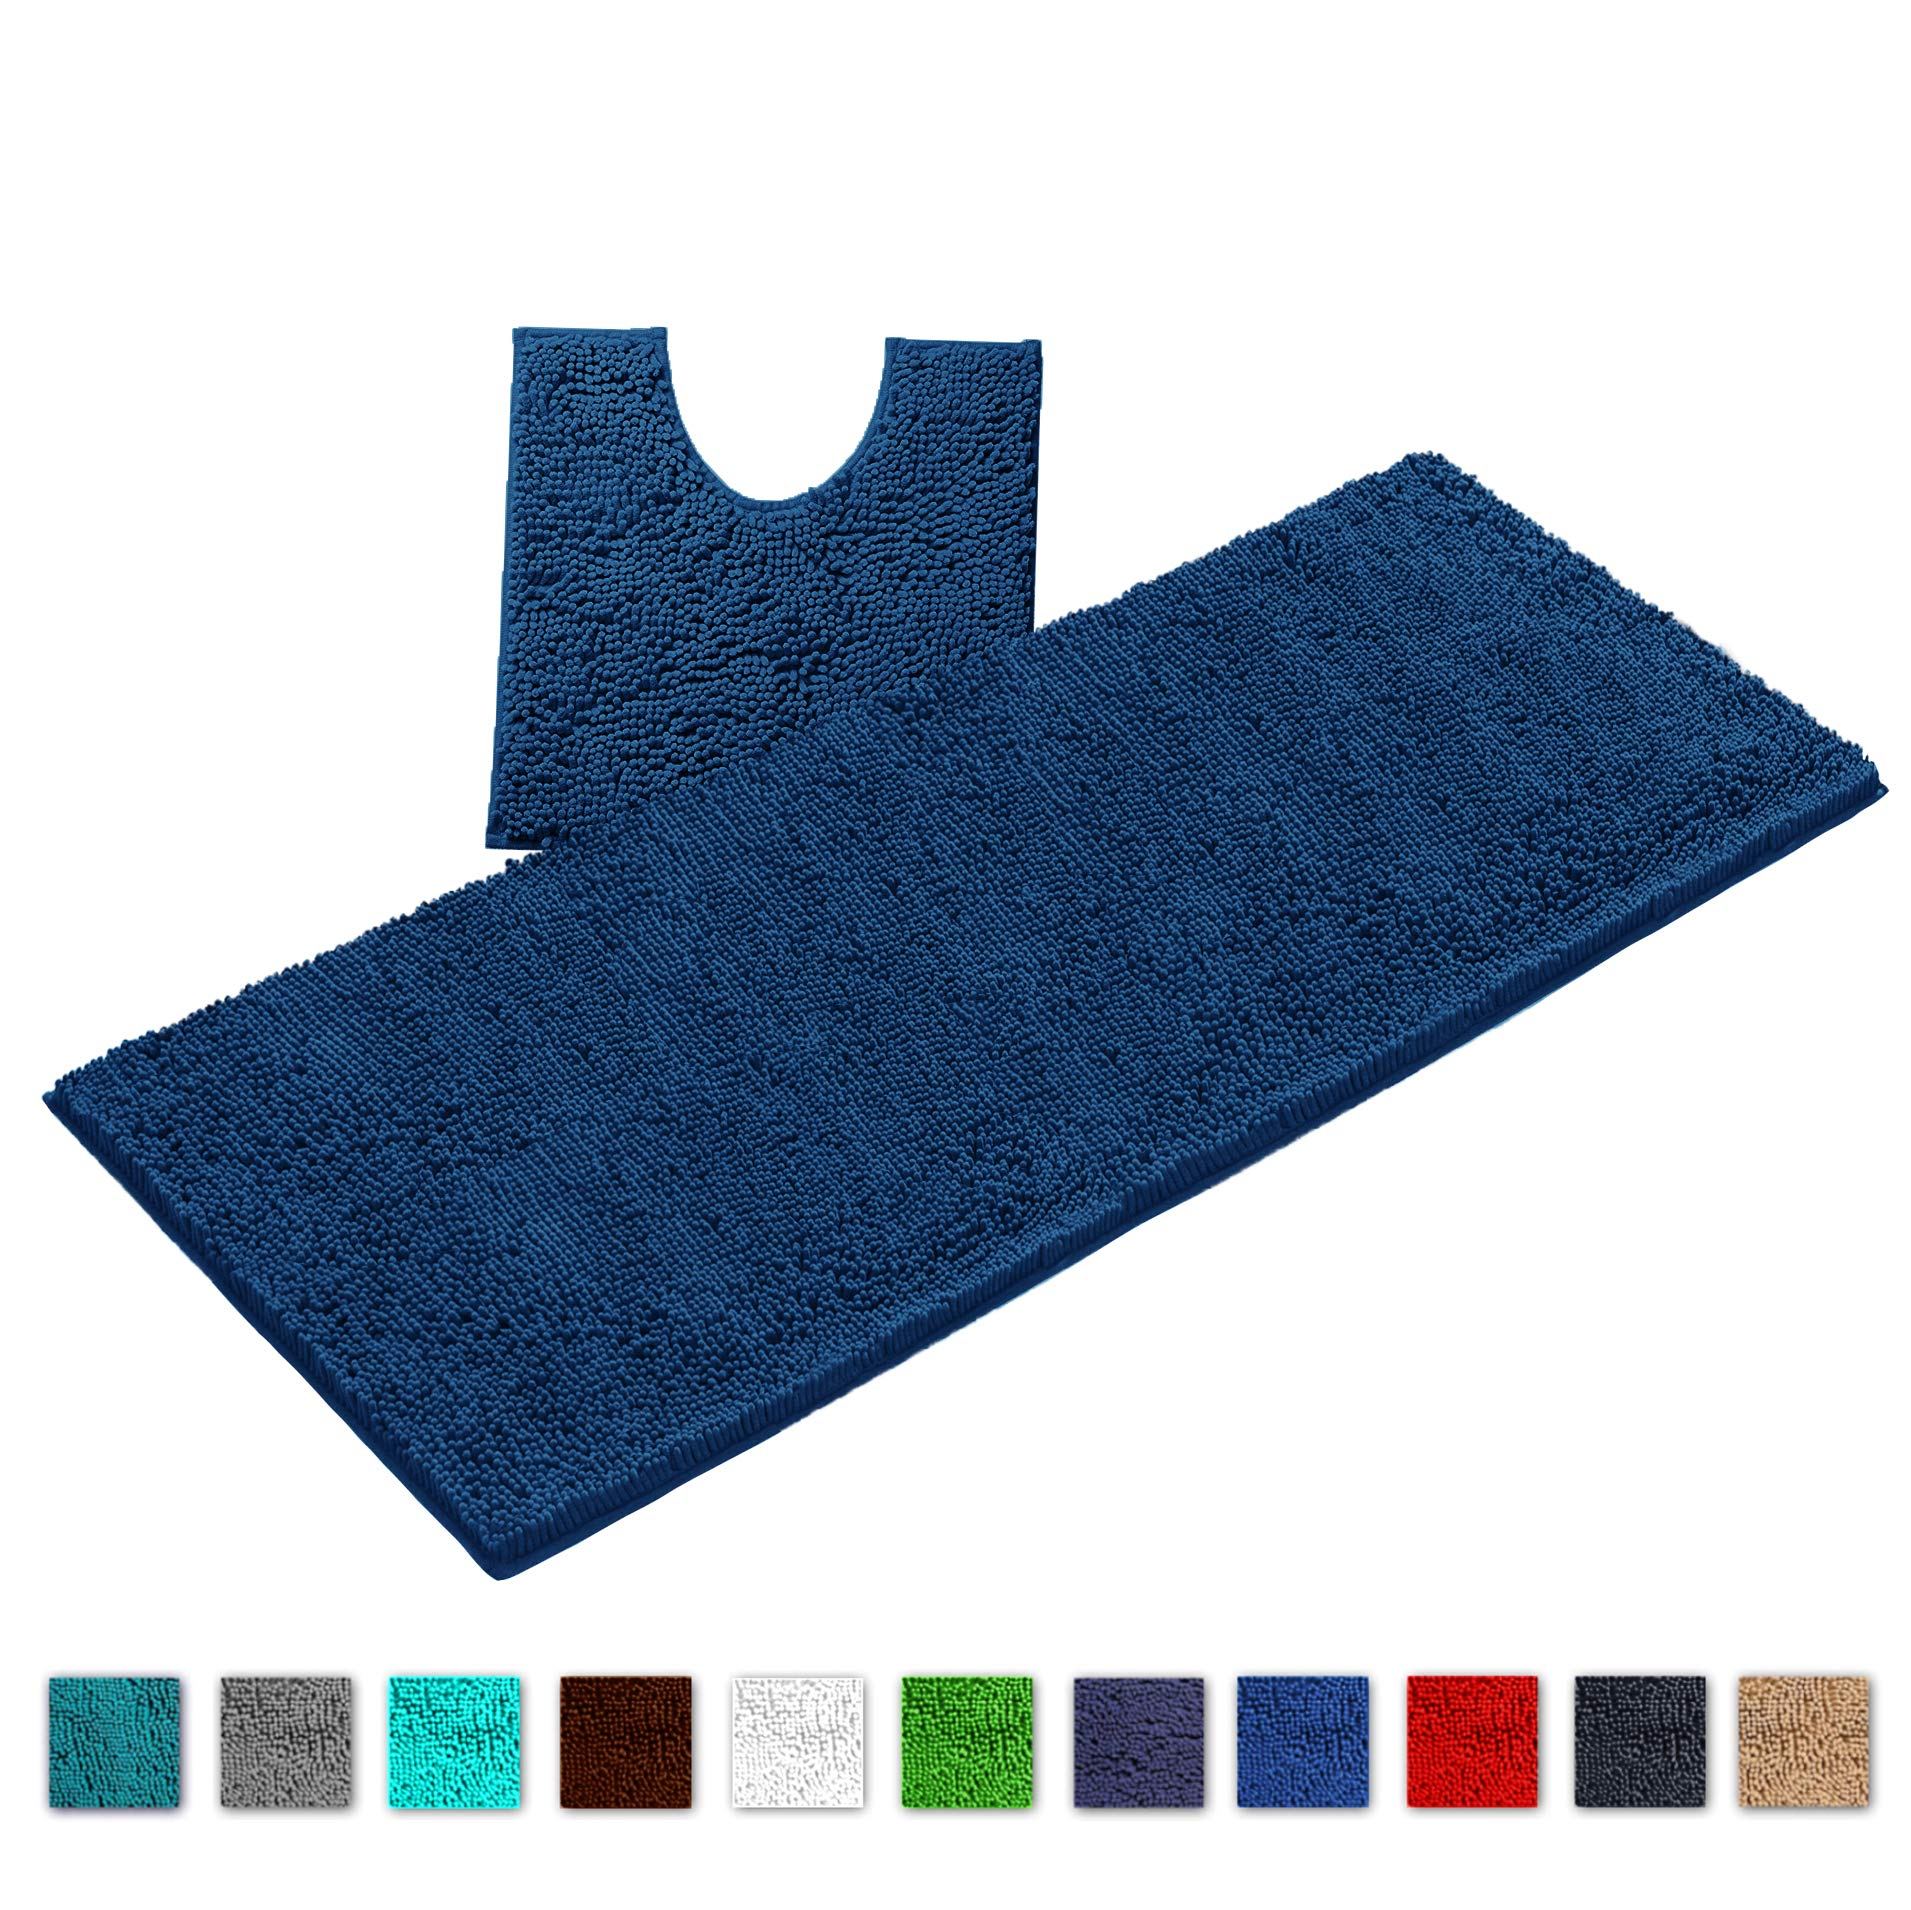 LuxUrux Bathroom Rugs Luxury Chenille 2-Piece Bath Mat Set, Soft Anti-Slip Bath Rug +Toilet Mat.1'' Microfiber Shaggy Carpet, Super Absorbent Machine Washable Bath Mats (Curved Set X-Large, Blue)